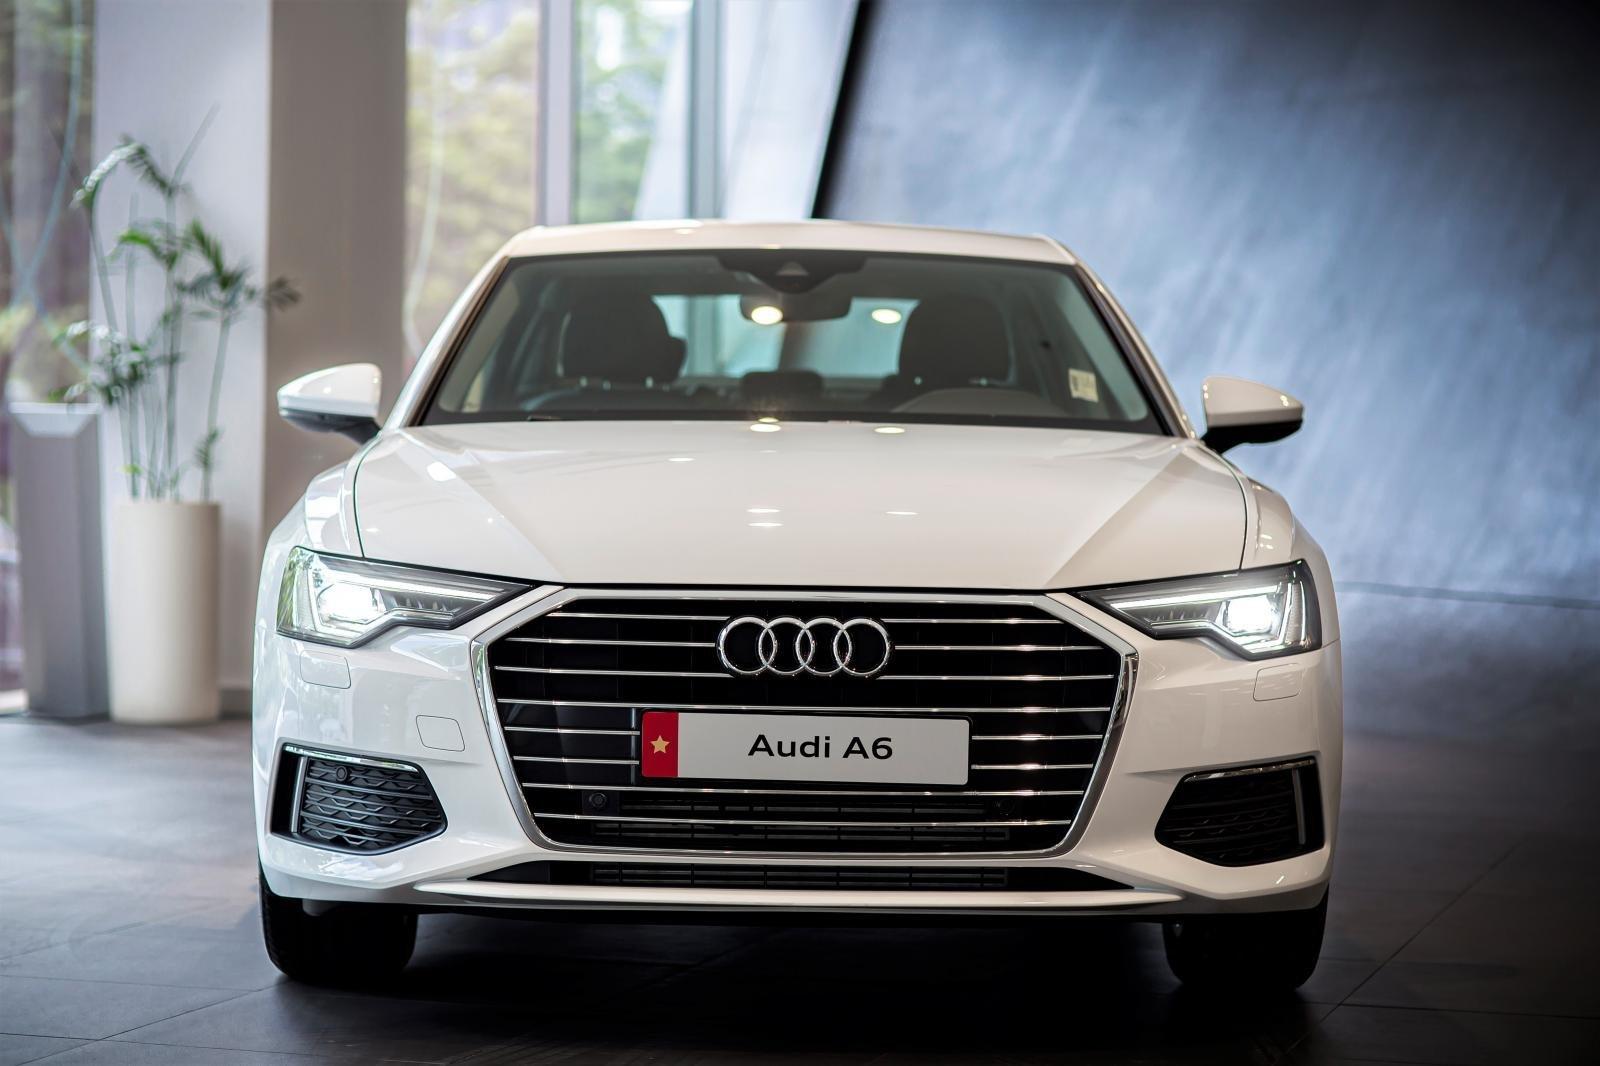 Ngoại thất xe Audi A6 2021.